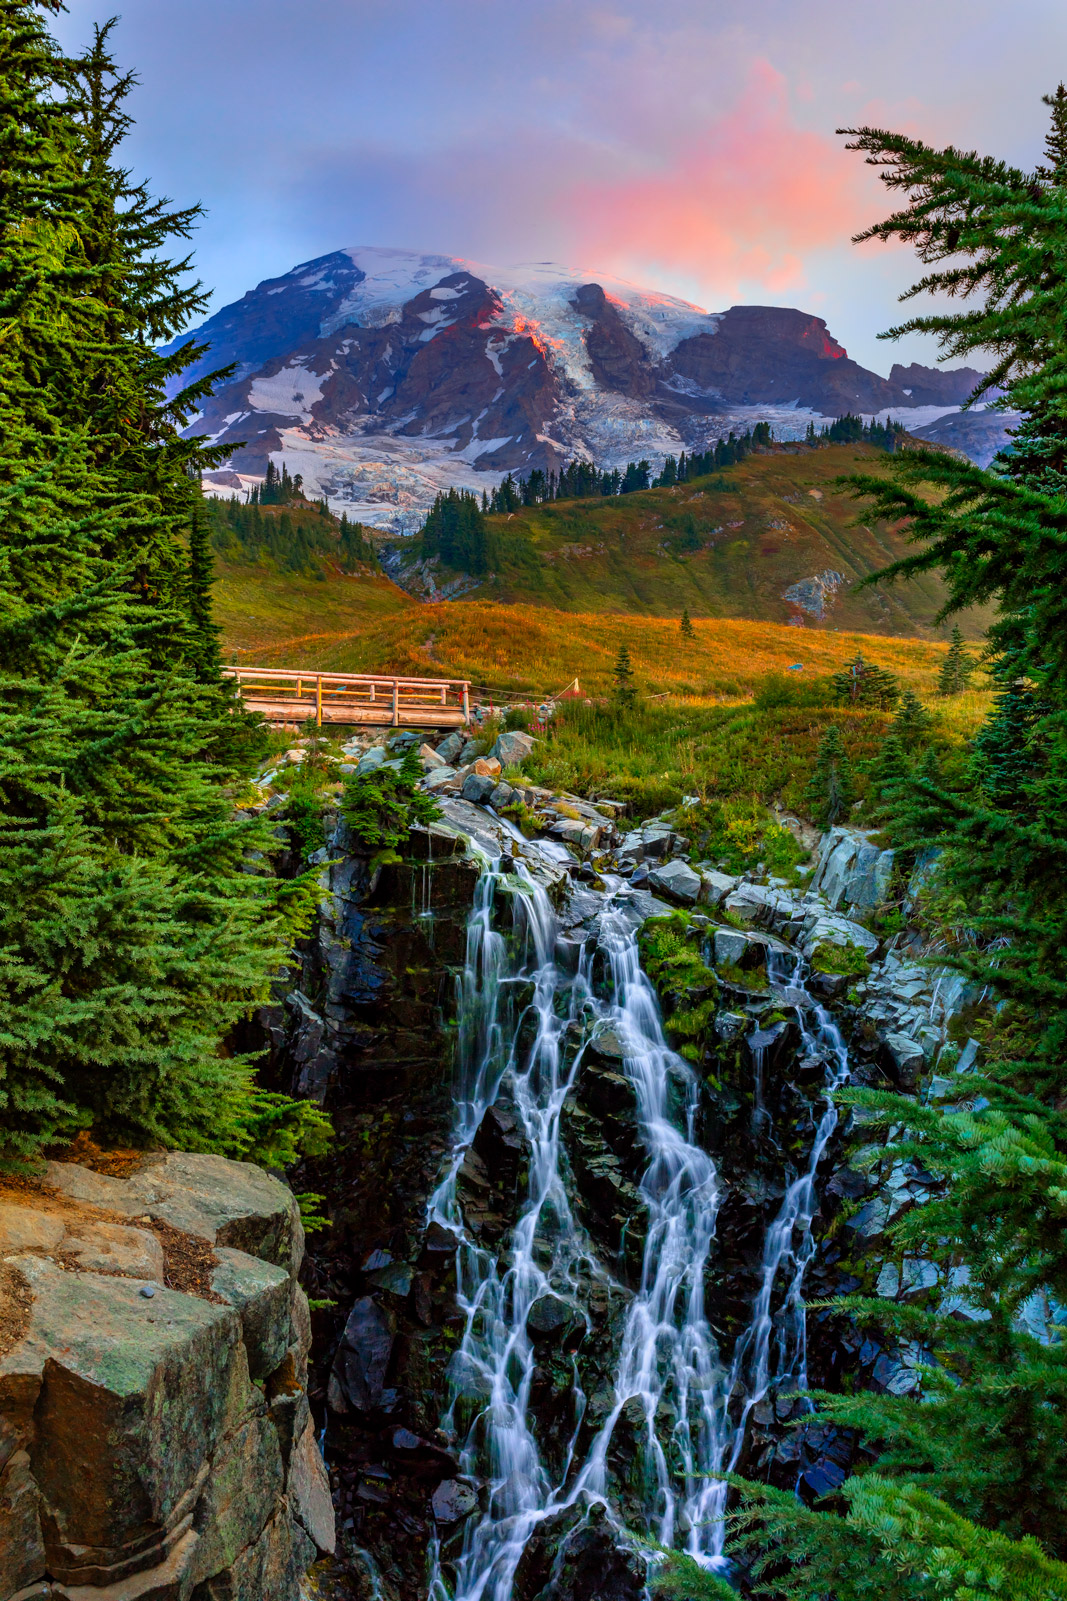 Washington, Mount Rainier, Mountain, Sunrise, Myrtle Falls, limited edition, photograph, fine art, landscape, photo